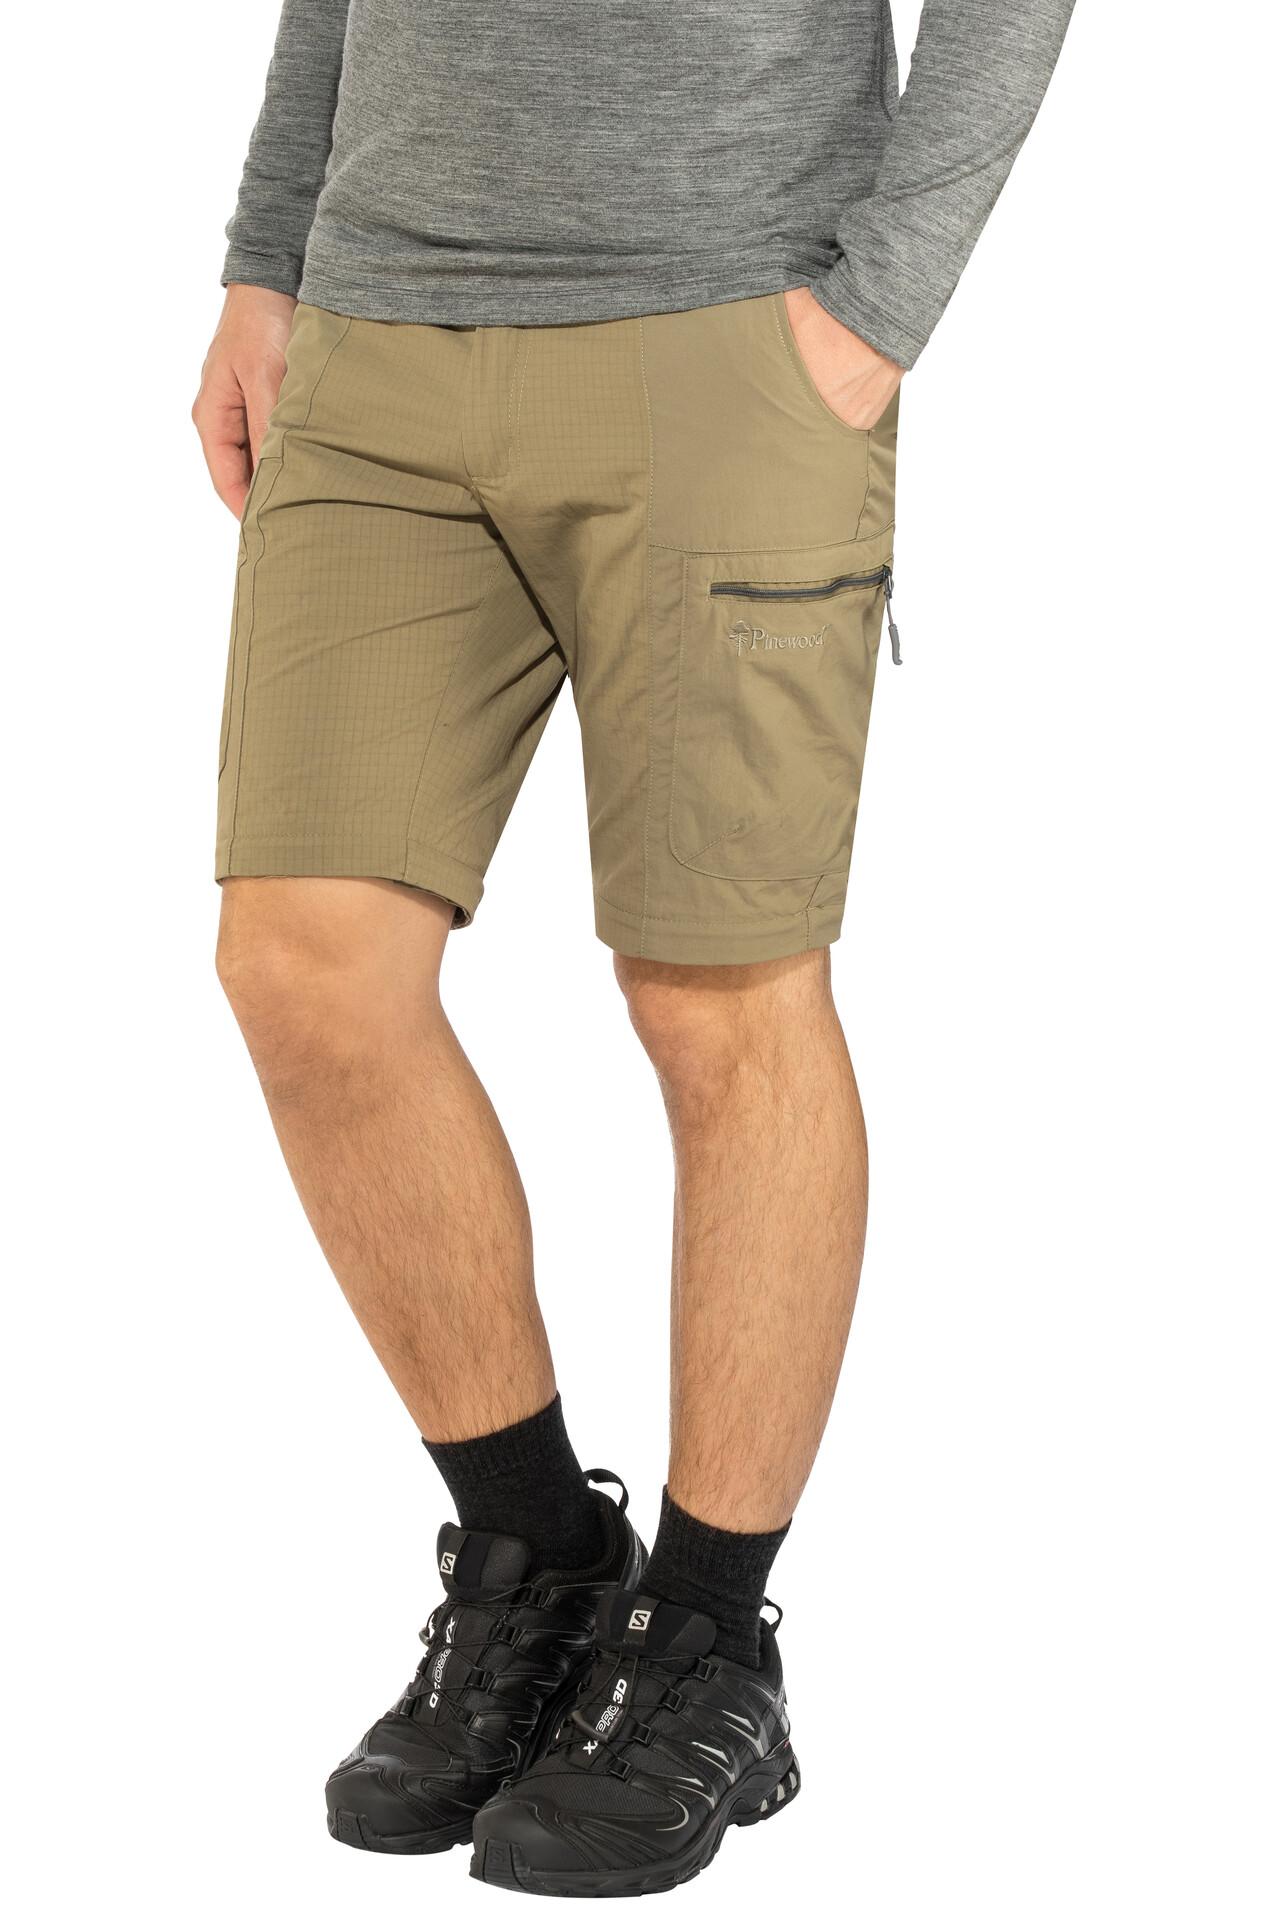 Pinewood M's M's M's Namibia Zip-Off Pants Mid Khaki 97b51d